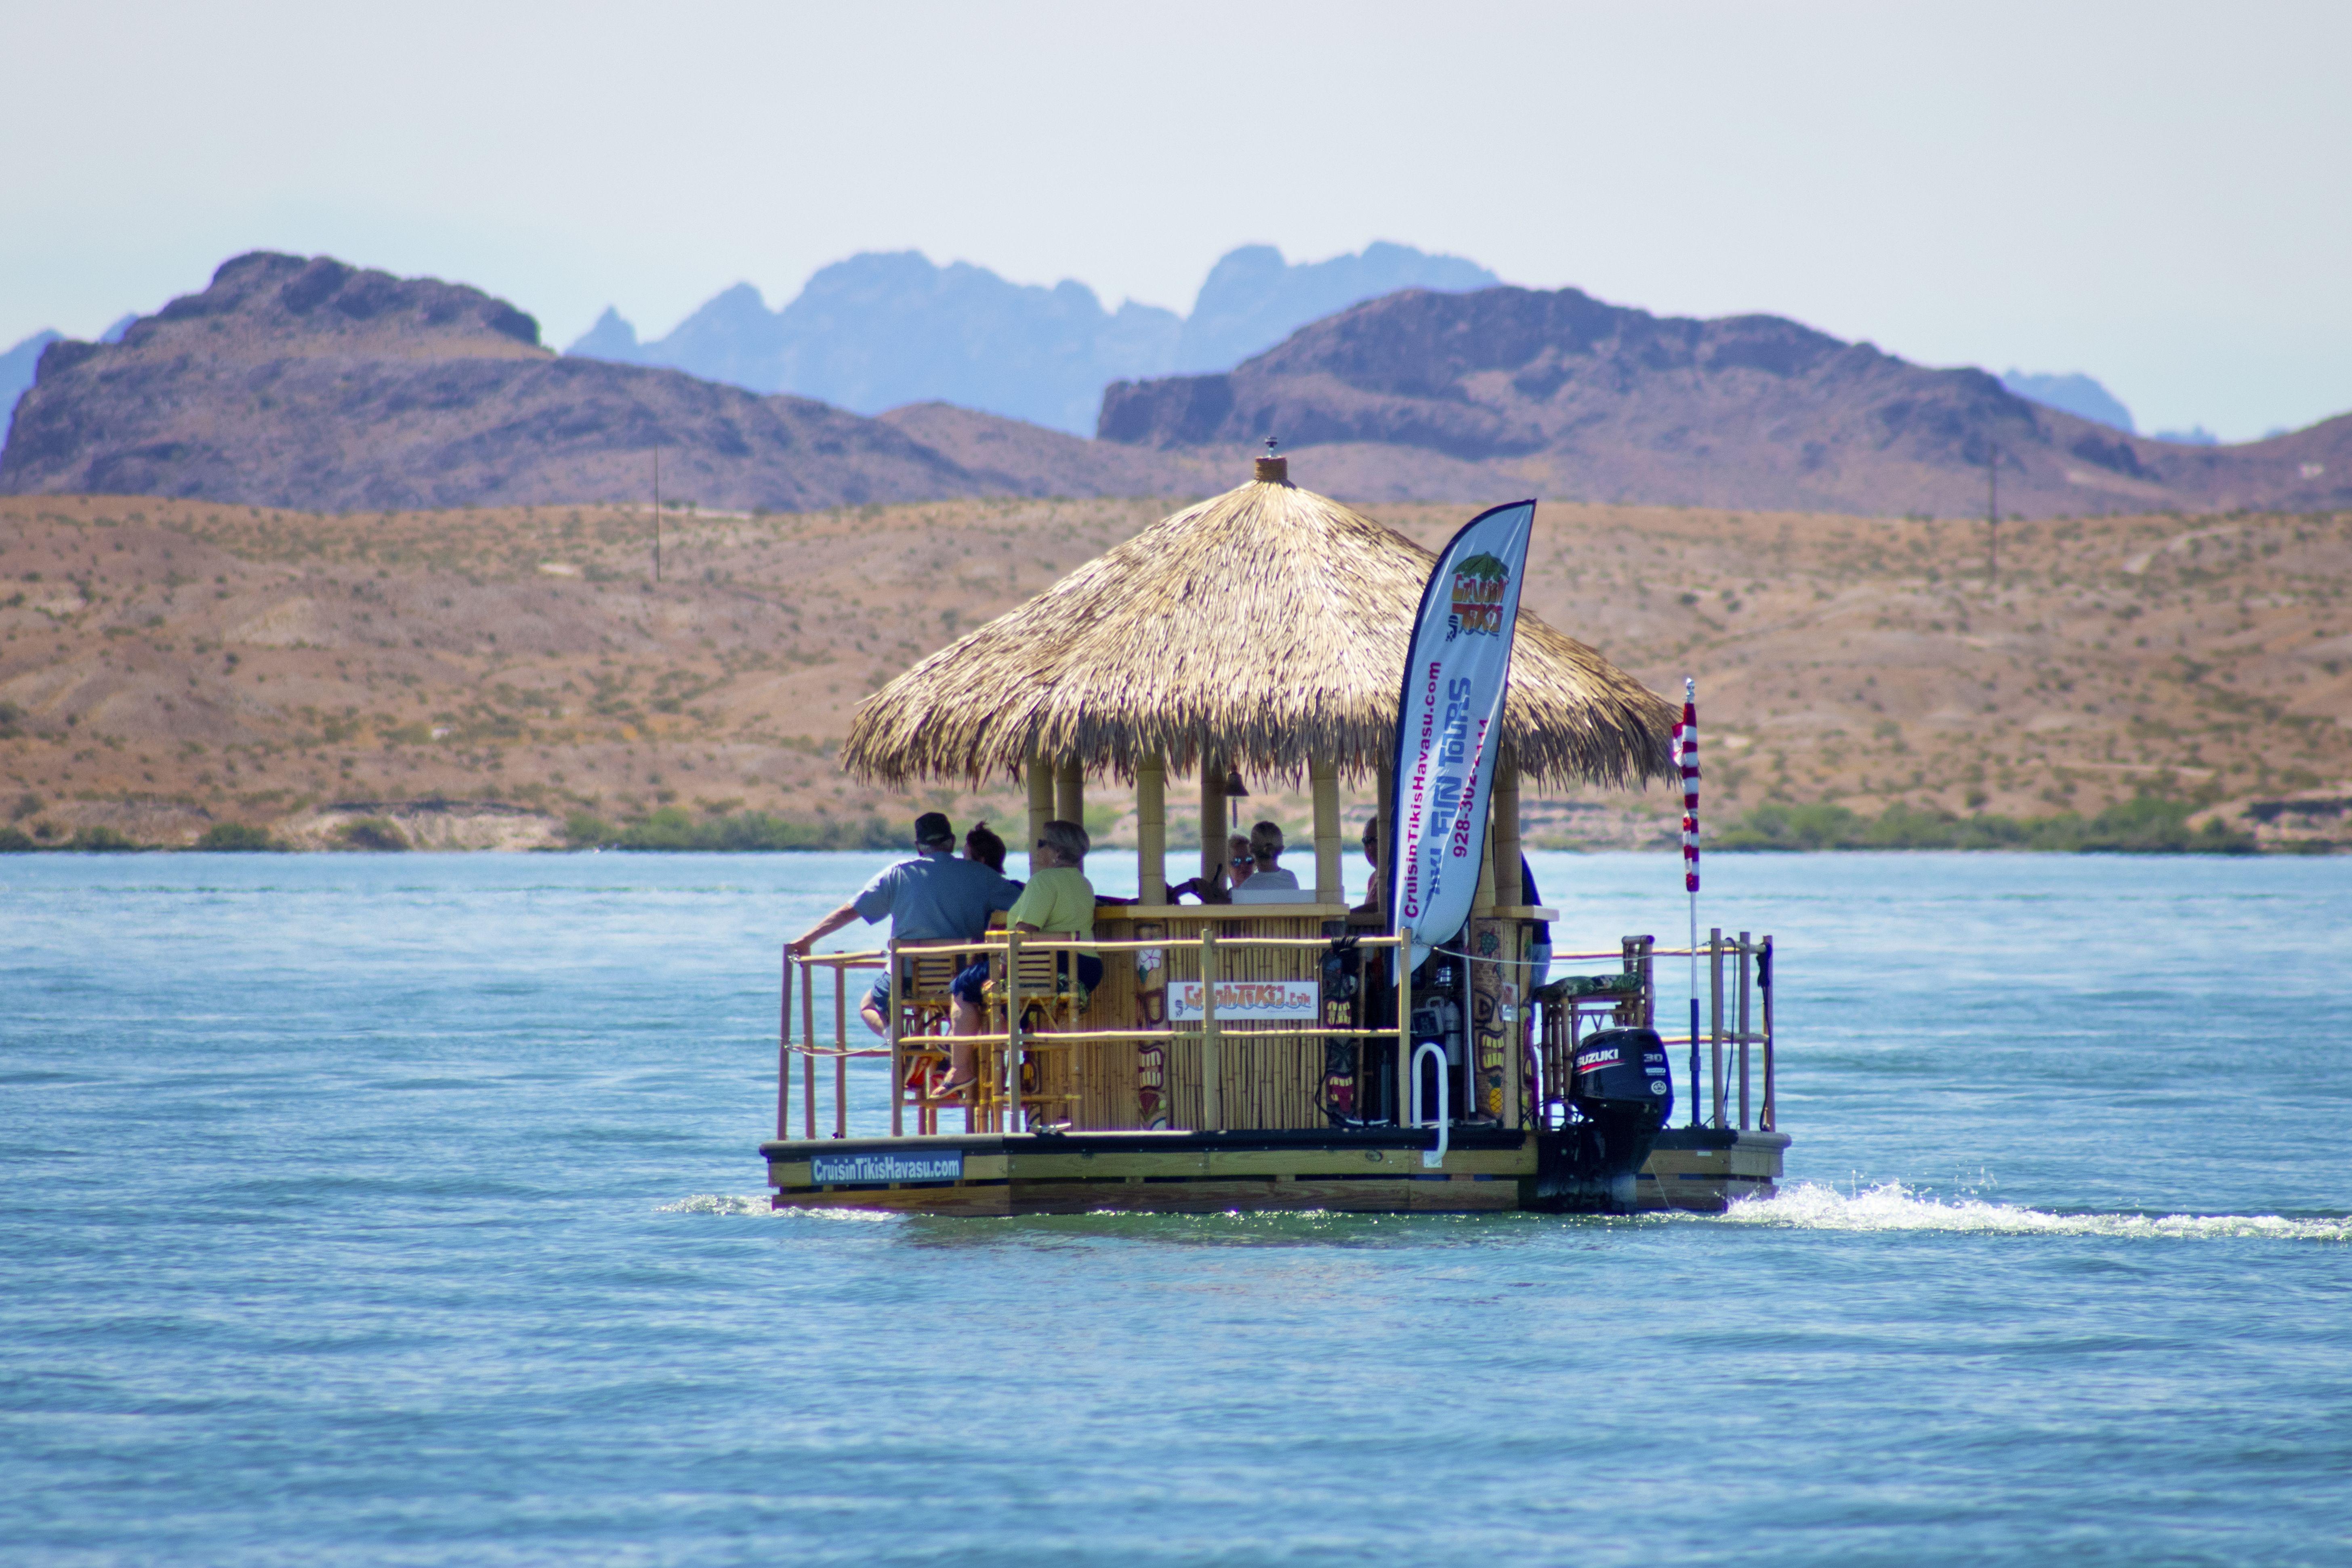 Enjoy cruisin lake havasu on a floating bar lake havasu